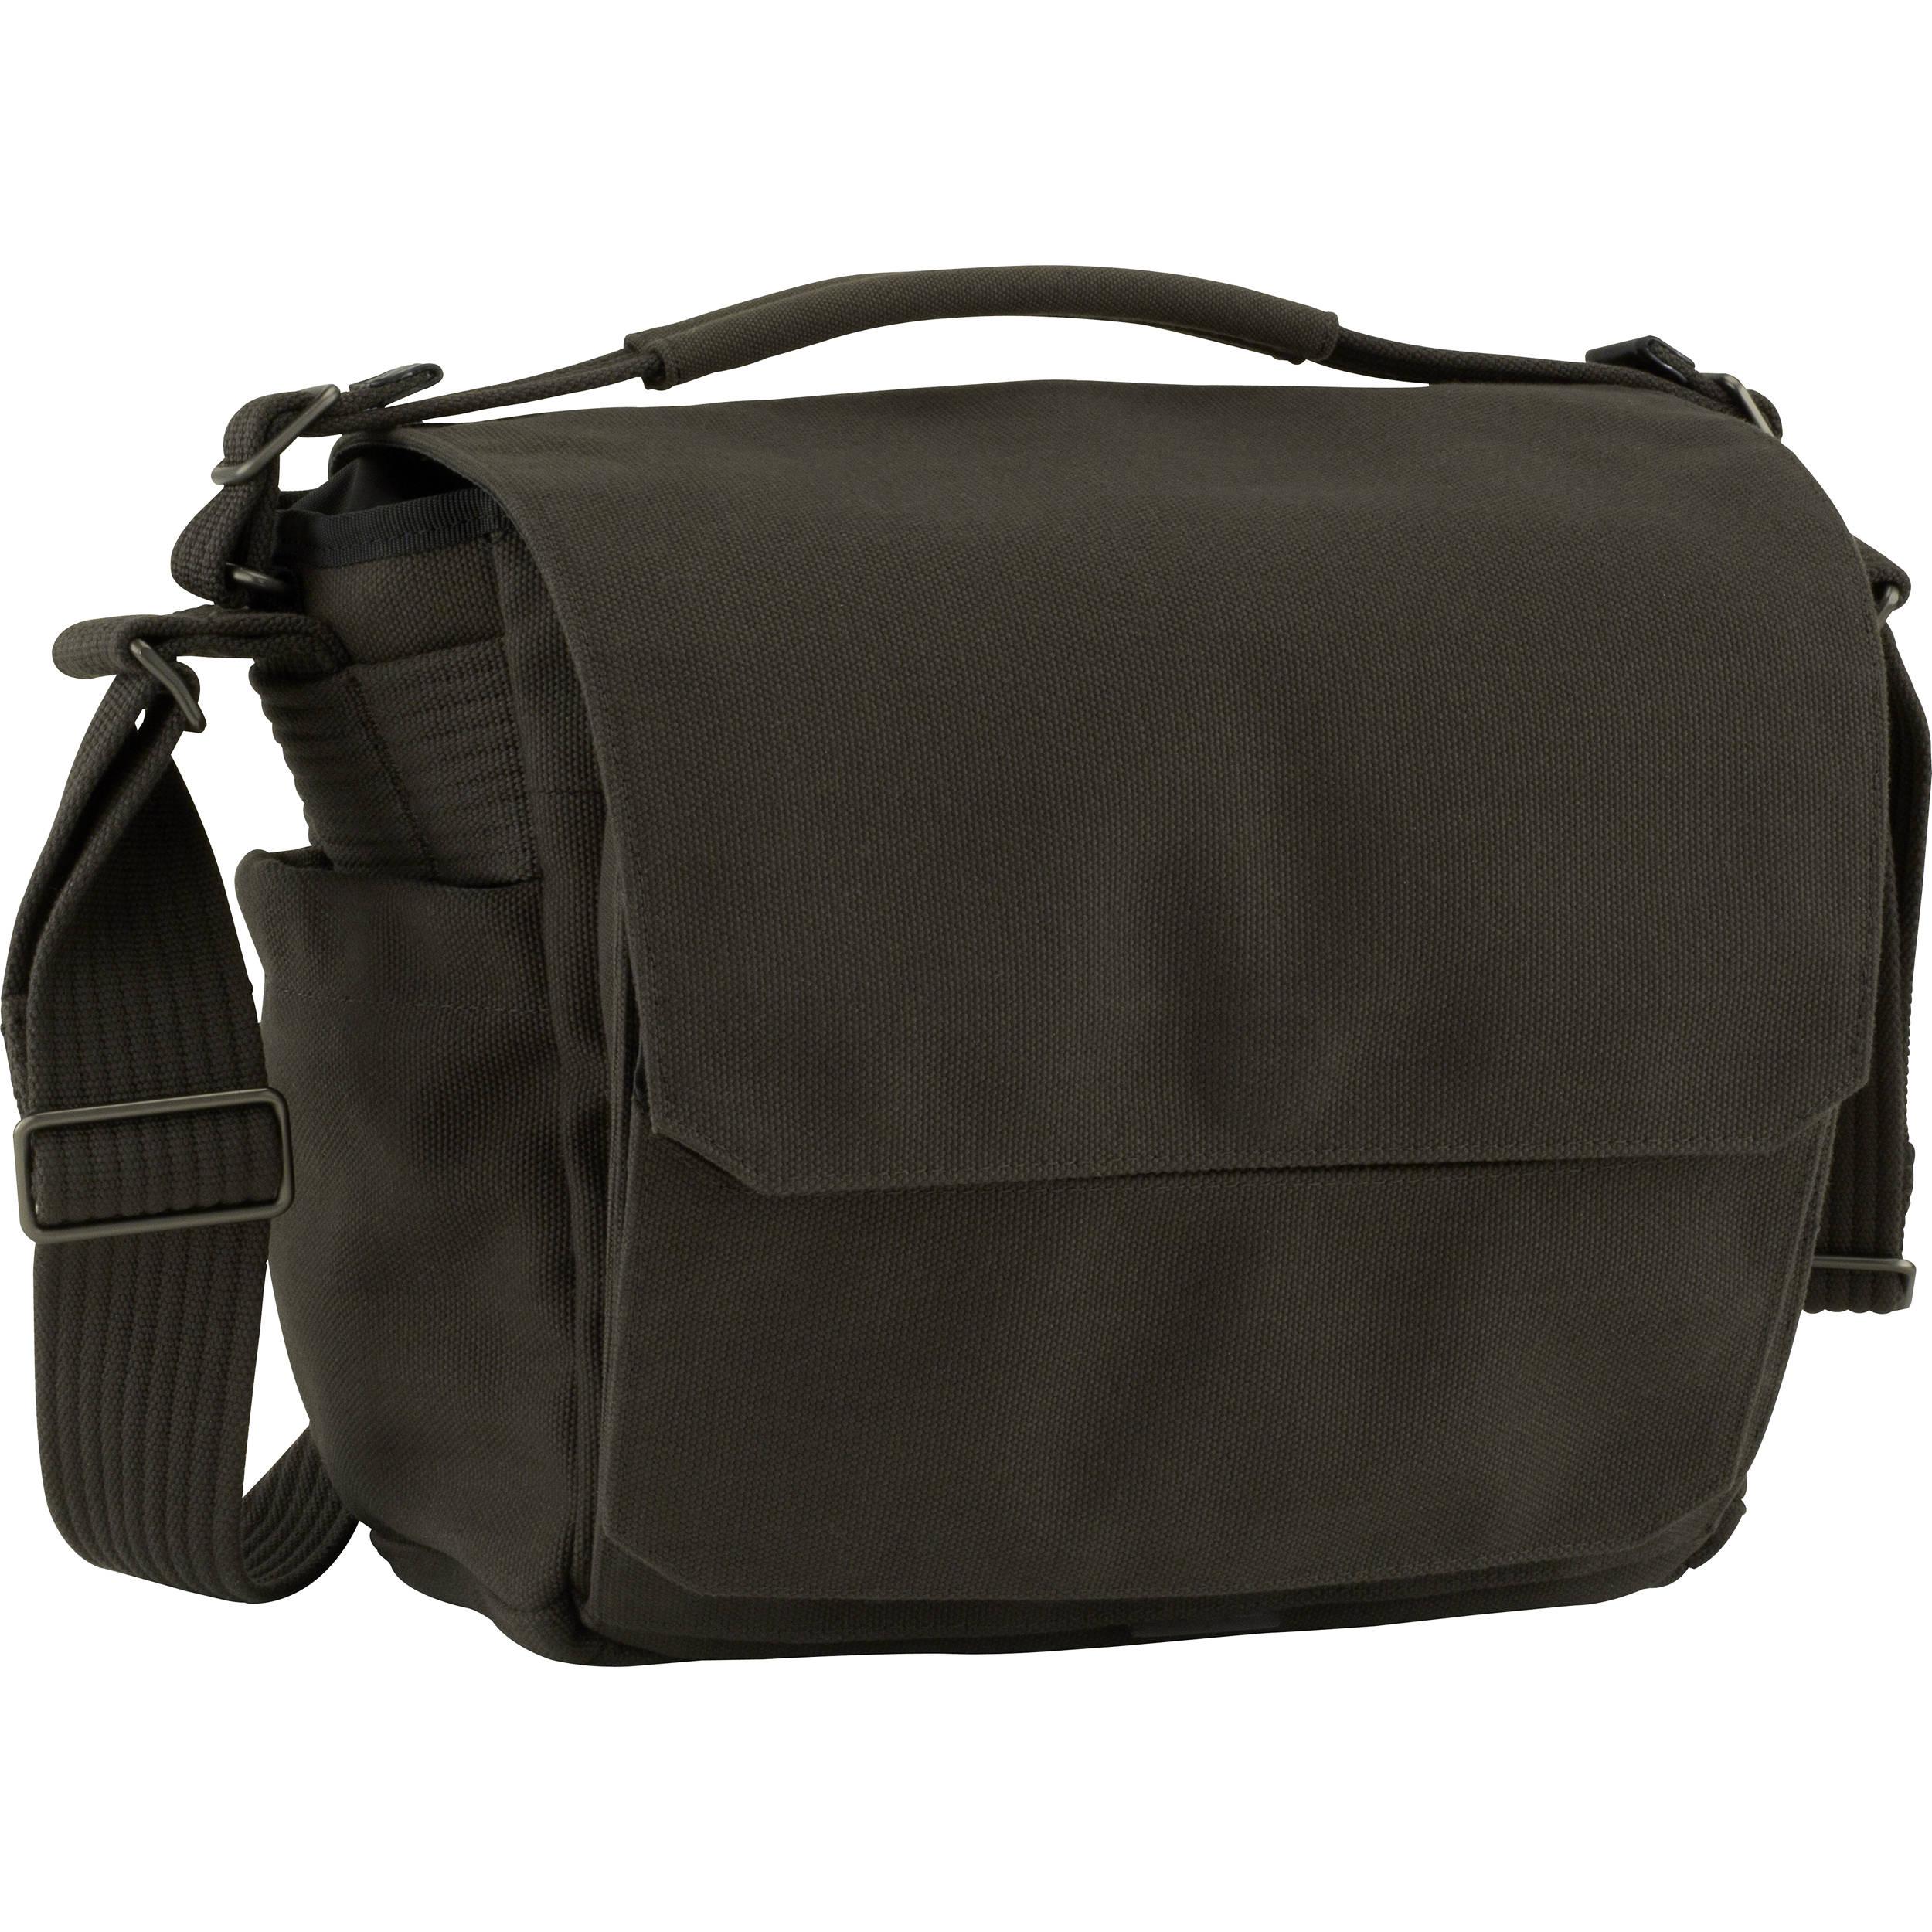 Lowepro Pro Messenger Bag 160 Aw Slate Gray